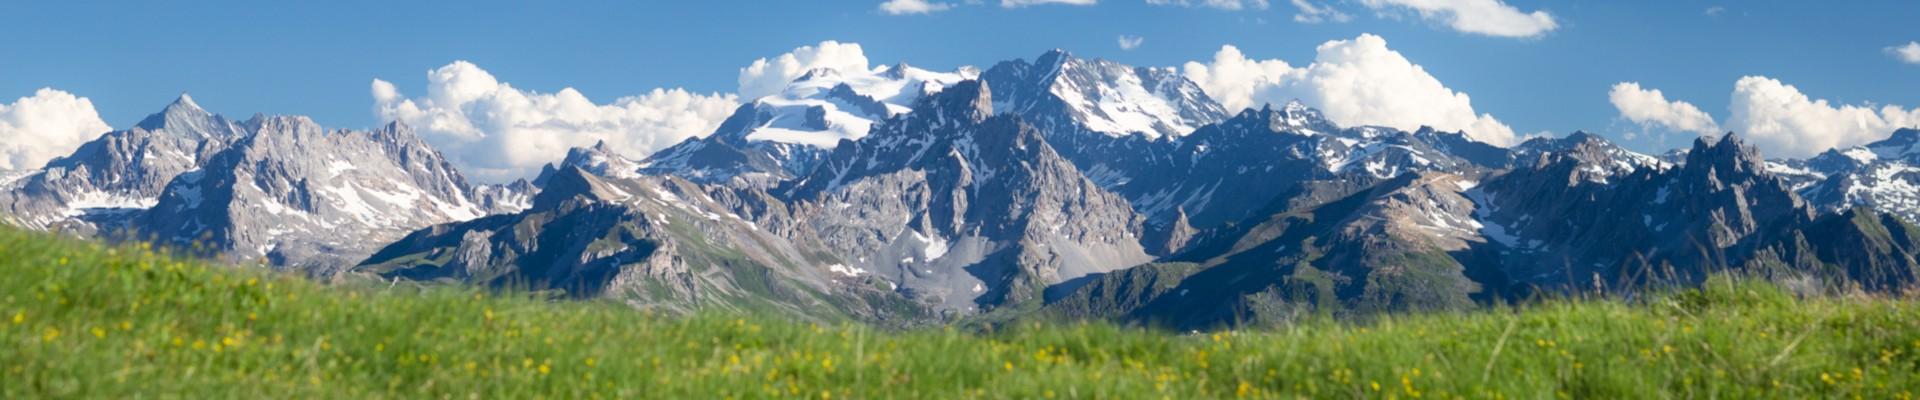 Discover Bozel's valley